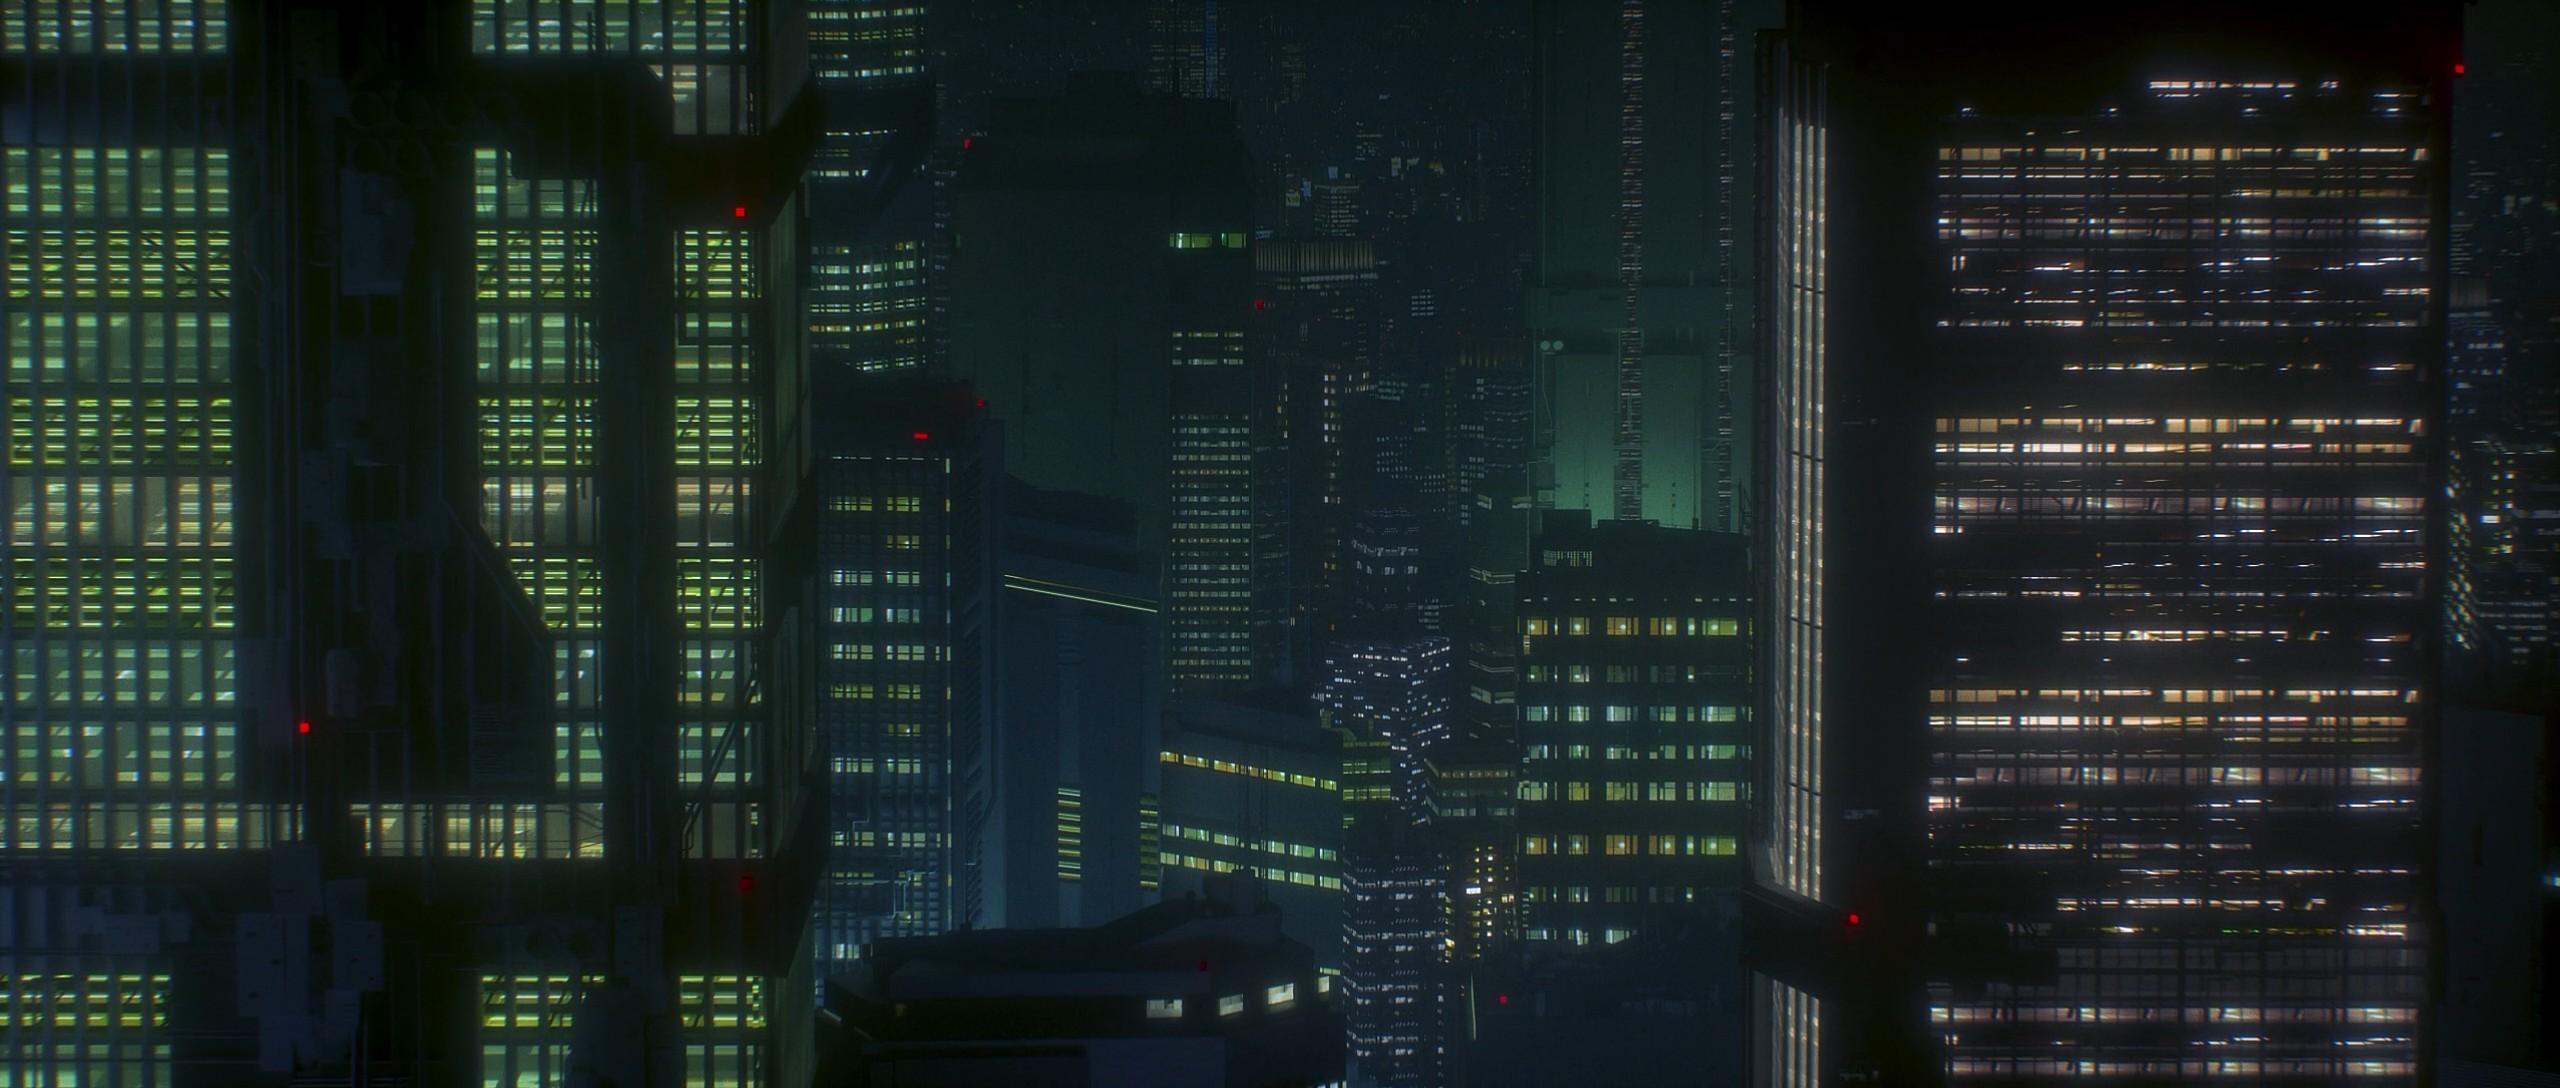 Anime 2560x1088 Akira awaken akira anime cyberpunk building neo-tokyo city Japan